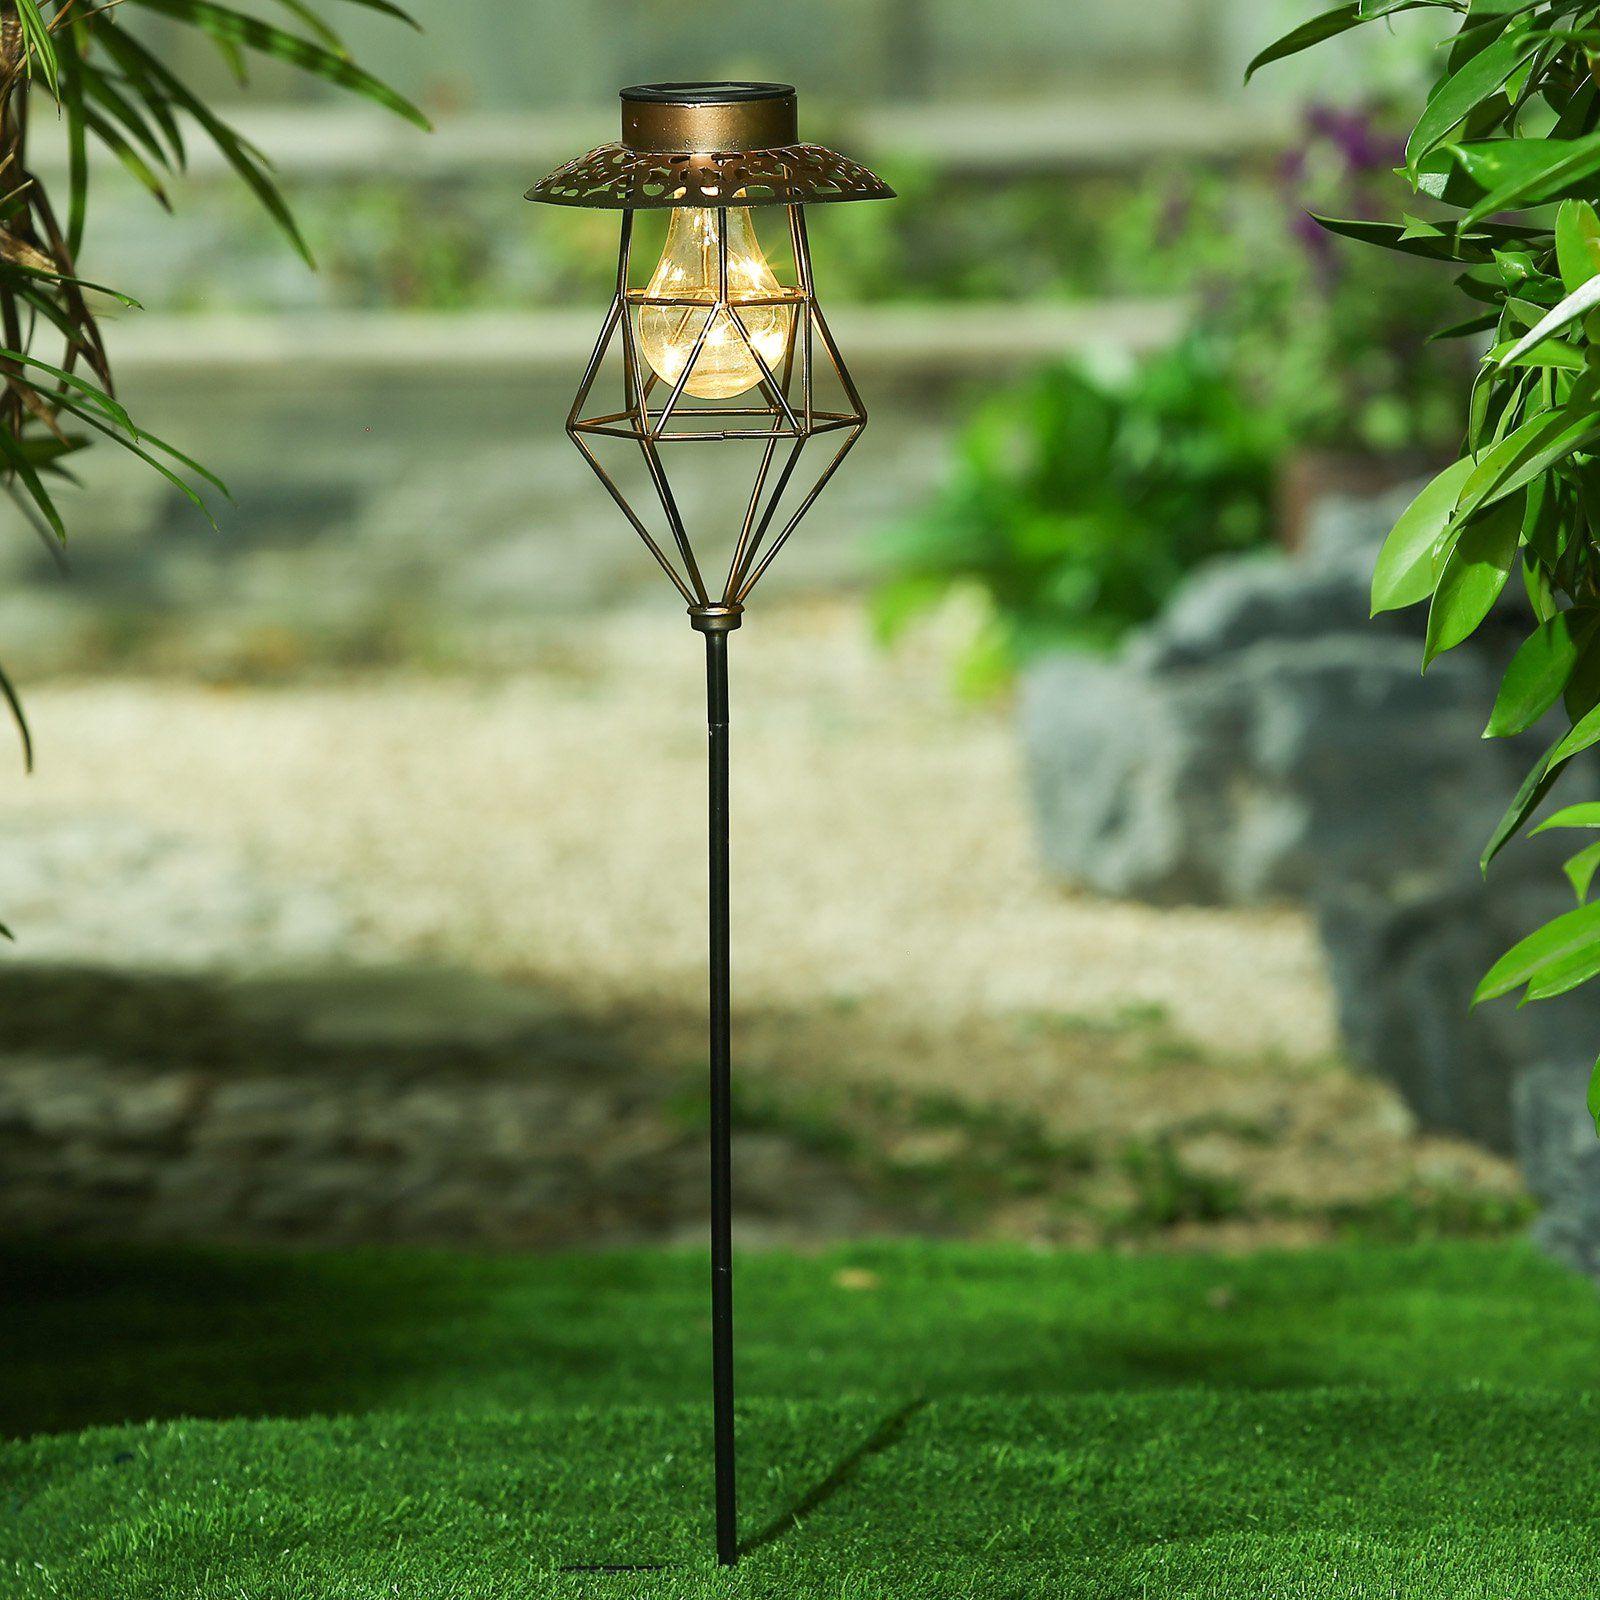 Winsome House Whsl280 Outdoor Cage Lantern Solar Garden